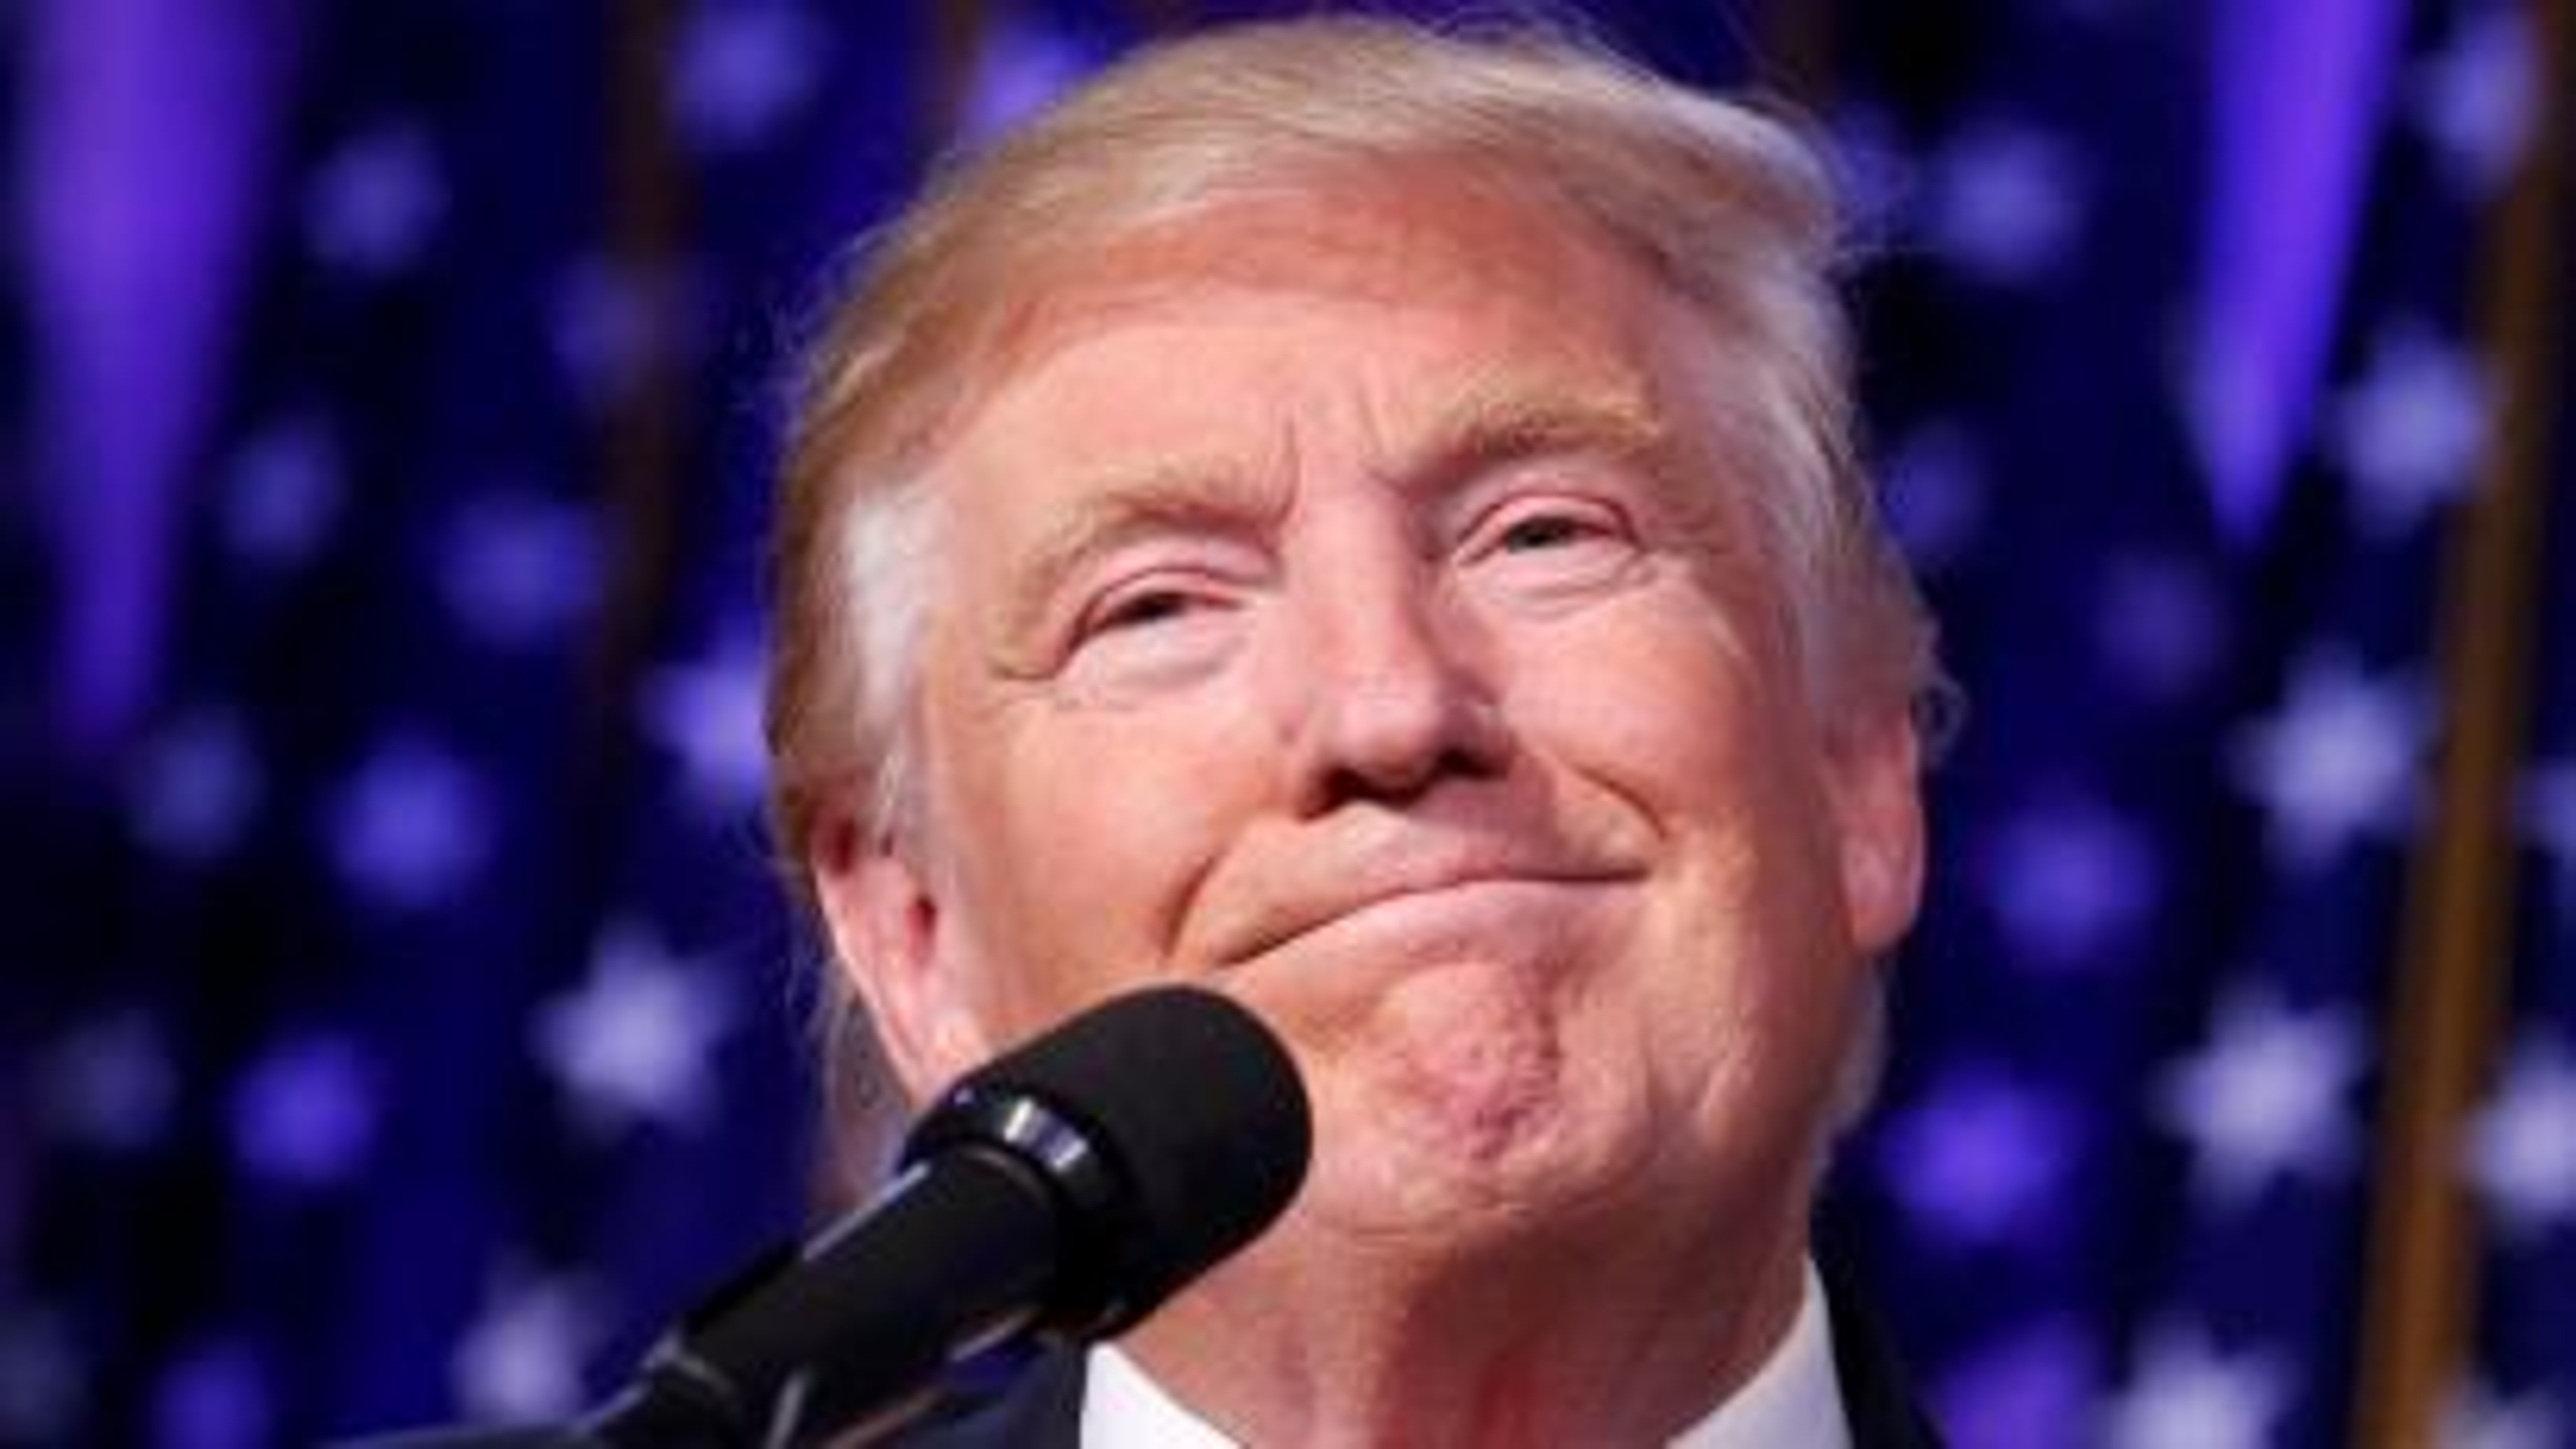 U.S. President-elect Donald Trump speaks at his election night rally in Manhattan, New York, U.S., November 9, 2016.